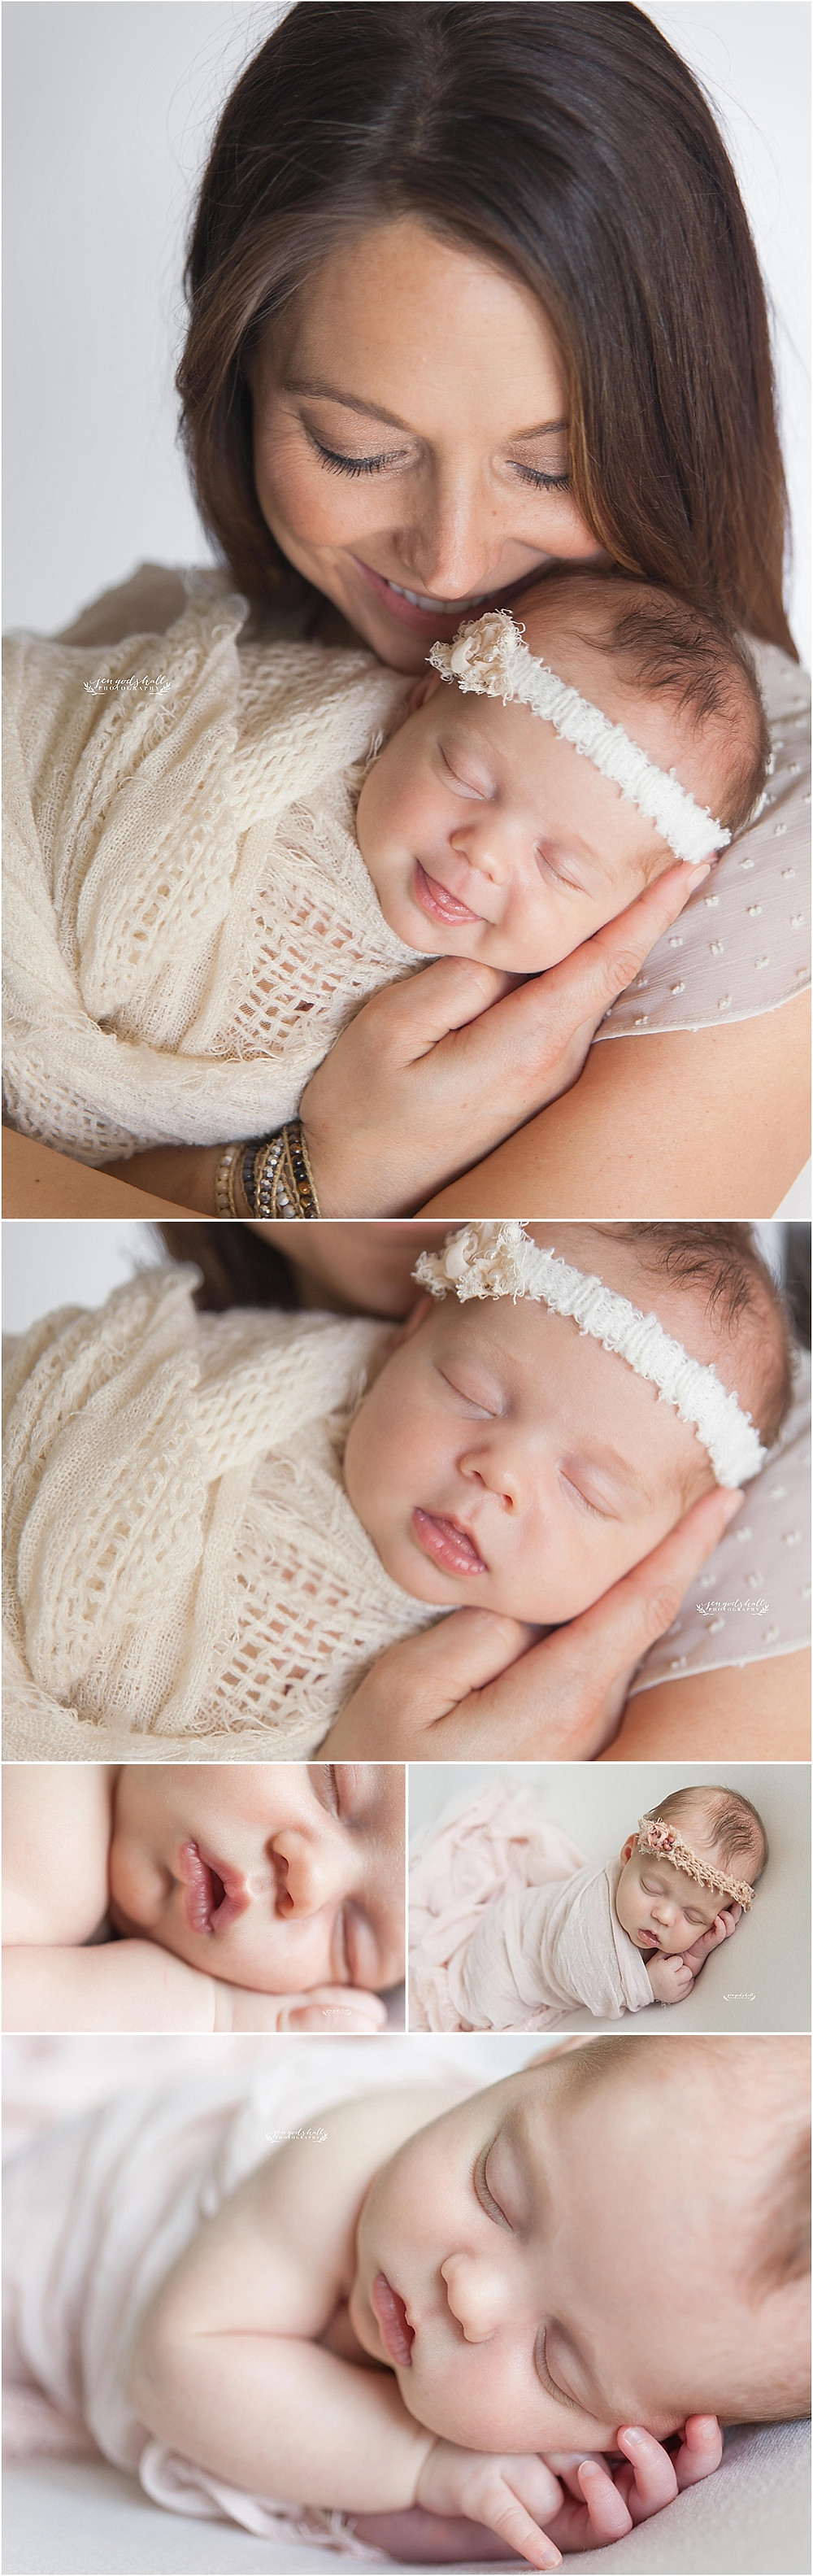 Newborn baby with mother by Sarasota Newborn Photographer Jen Godshall